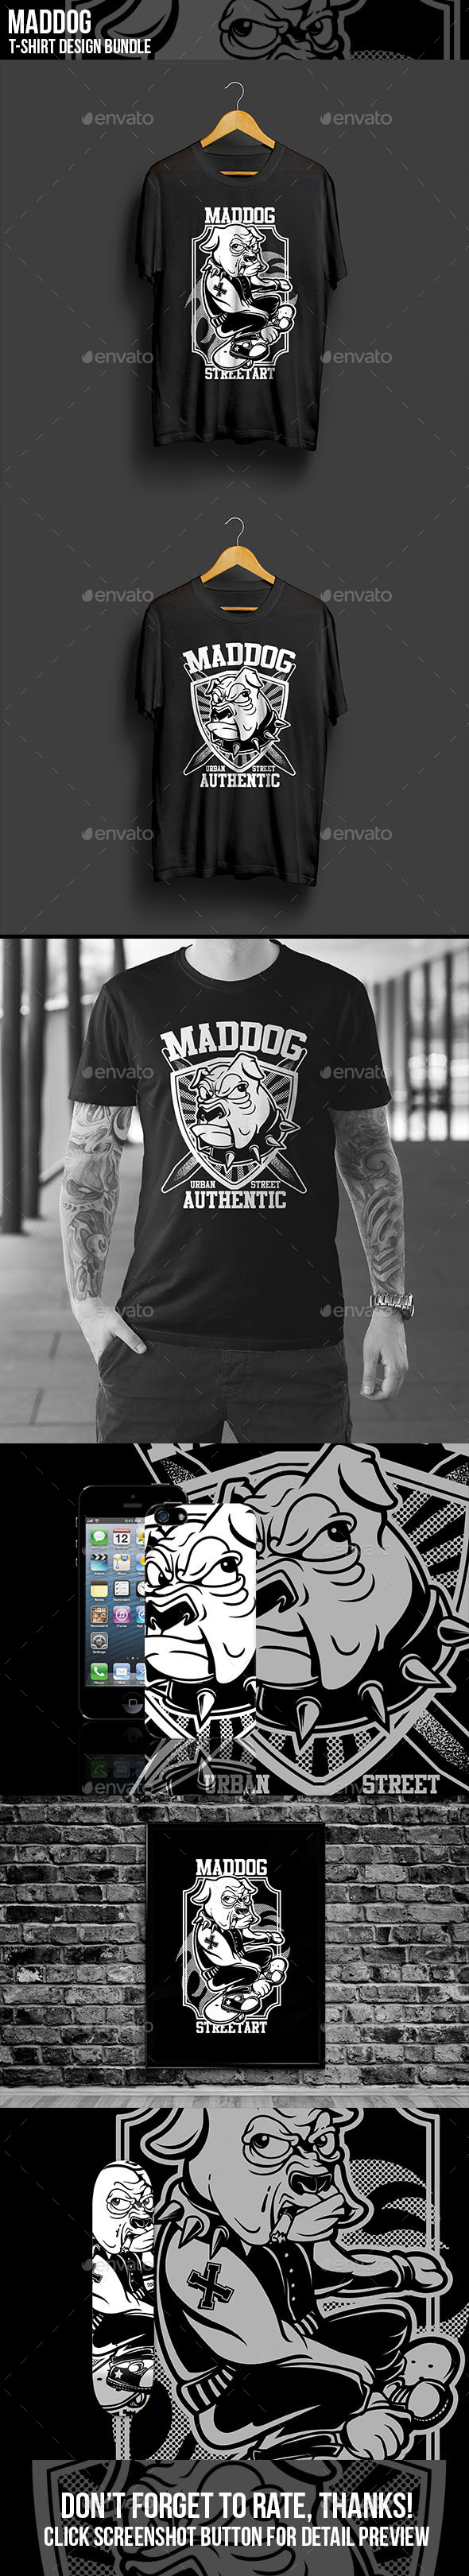 Maddog T-Shirt Design Bundle - Funny Designs